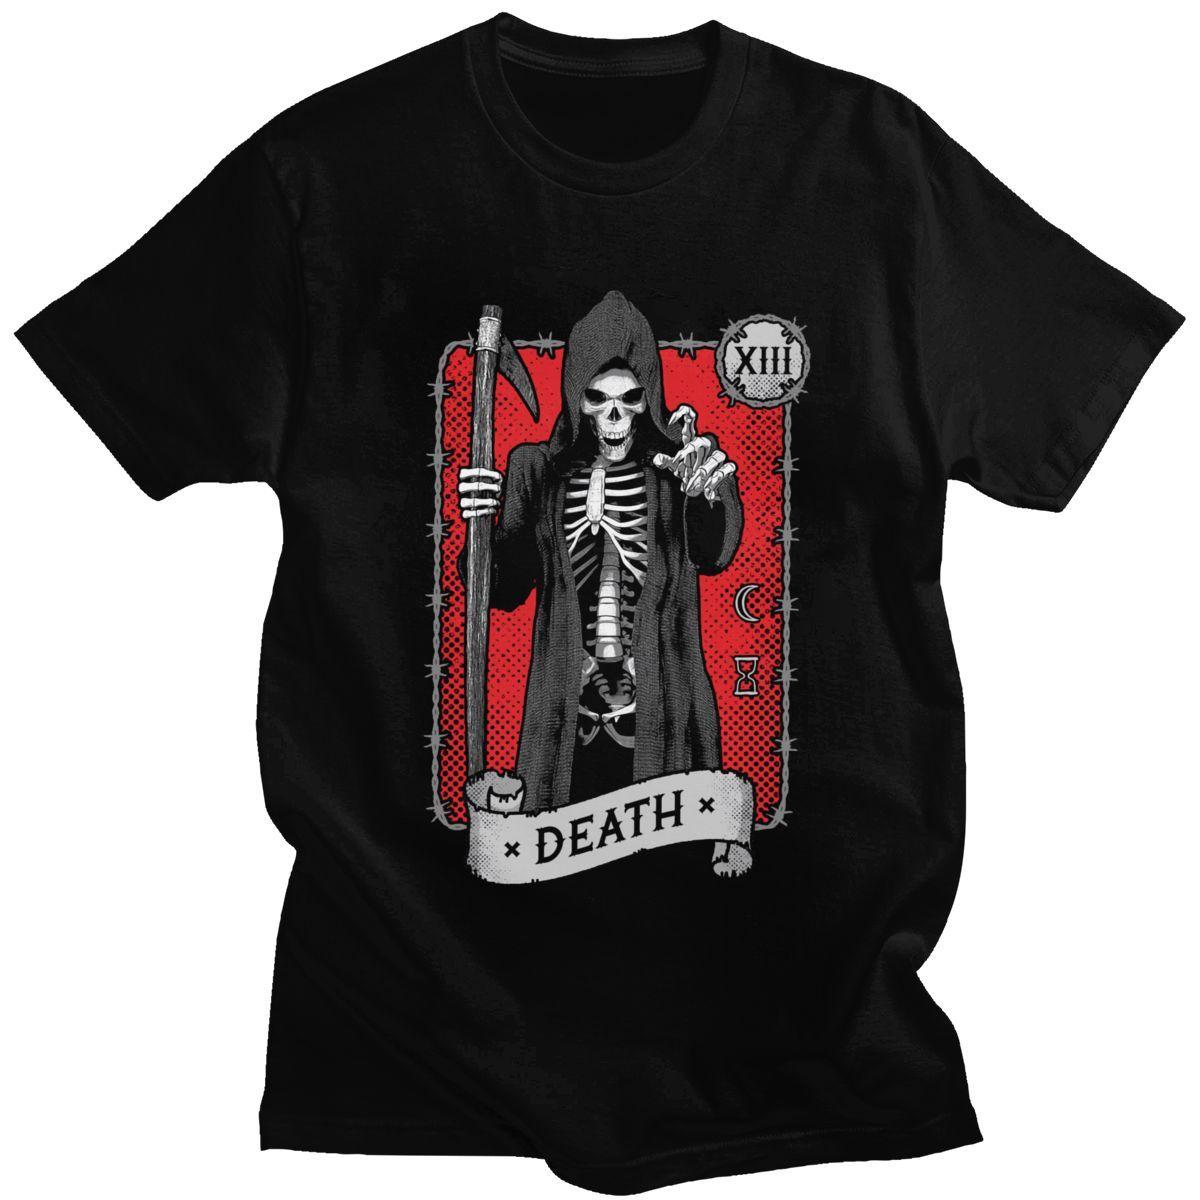 Death Tarot Card Occult Grim Reaper Astrology RED T Shirt Men Soft Cotton Handsome T-Shirt Short Sleeve Halloween Witch Tee Tops